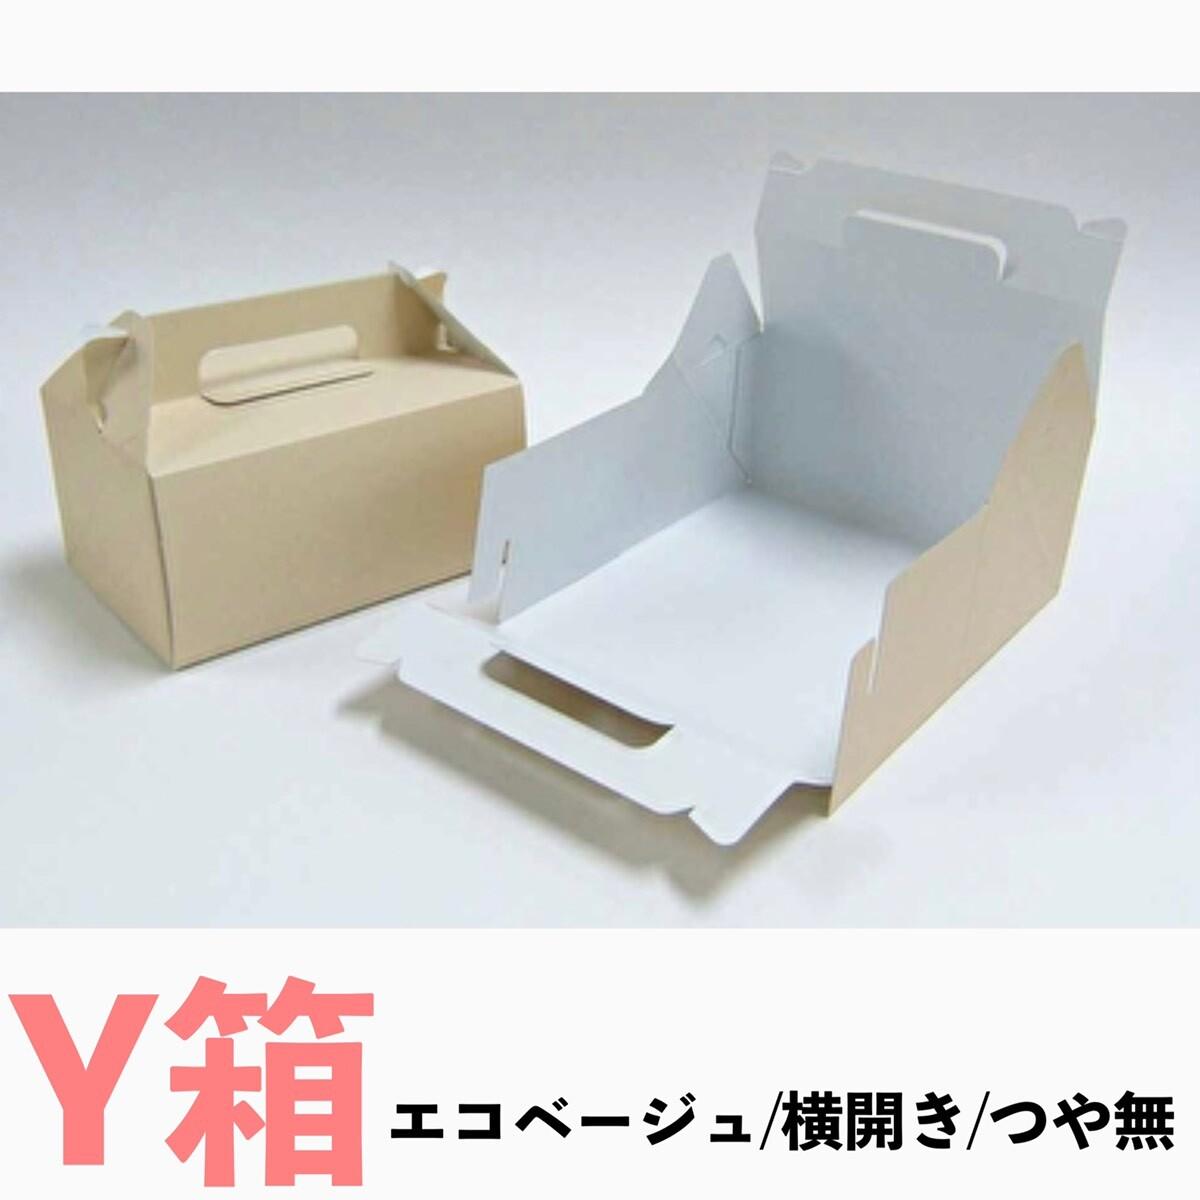 画像1: C-エコ-Y(横入れ)/2Y/4Y/6Y/8Y/10Y (1)